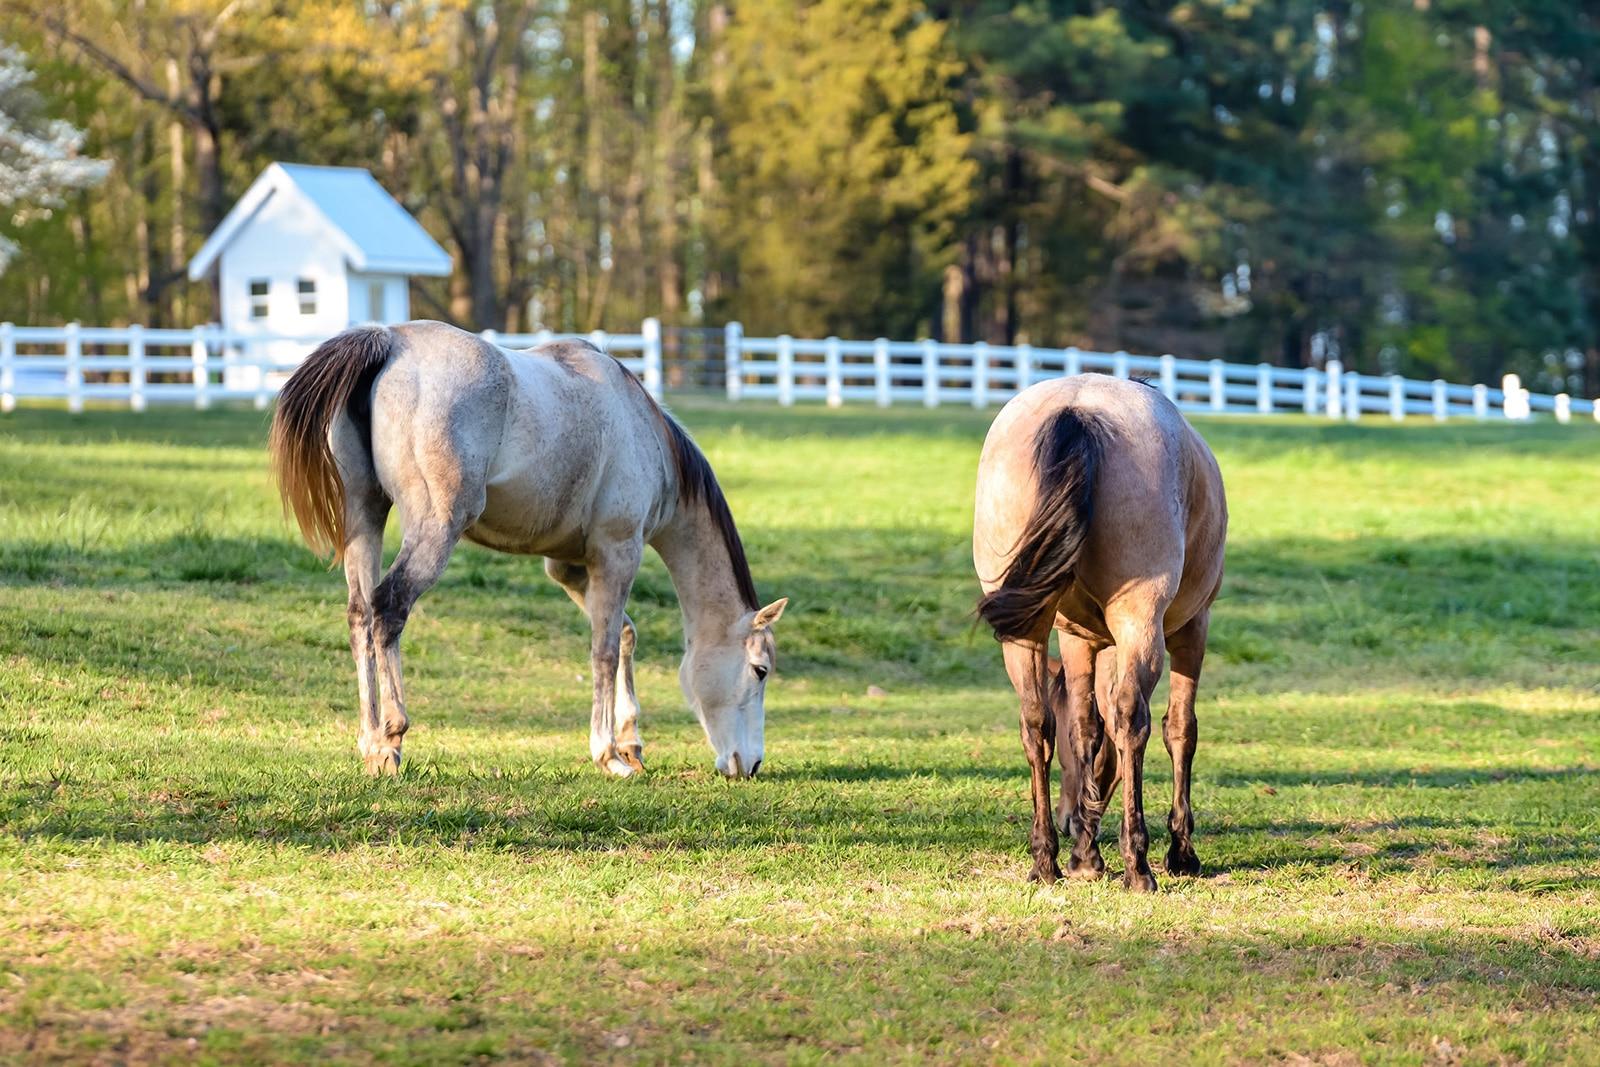 2 horses grazing in a field